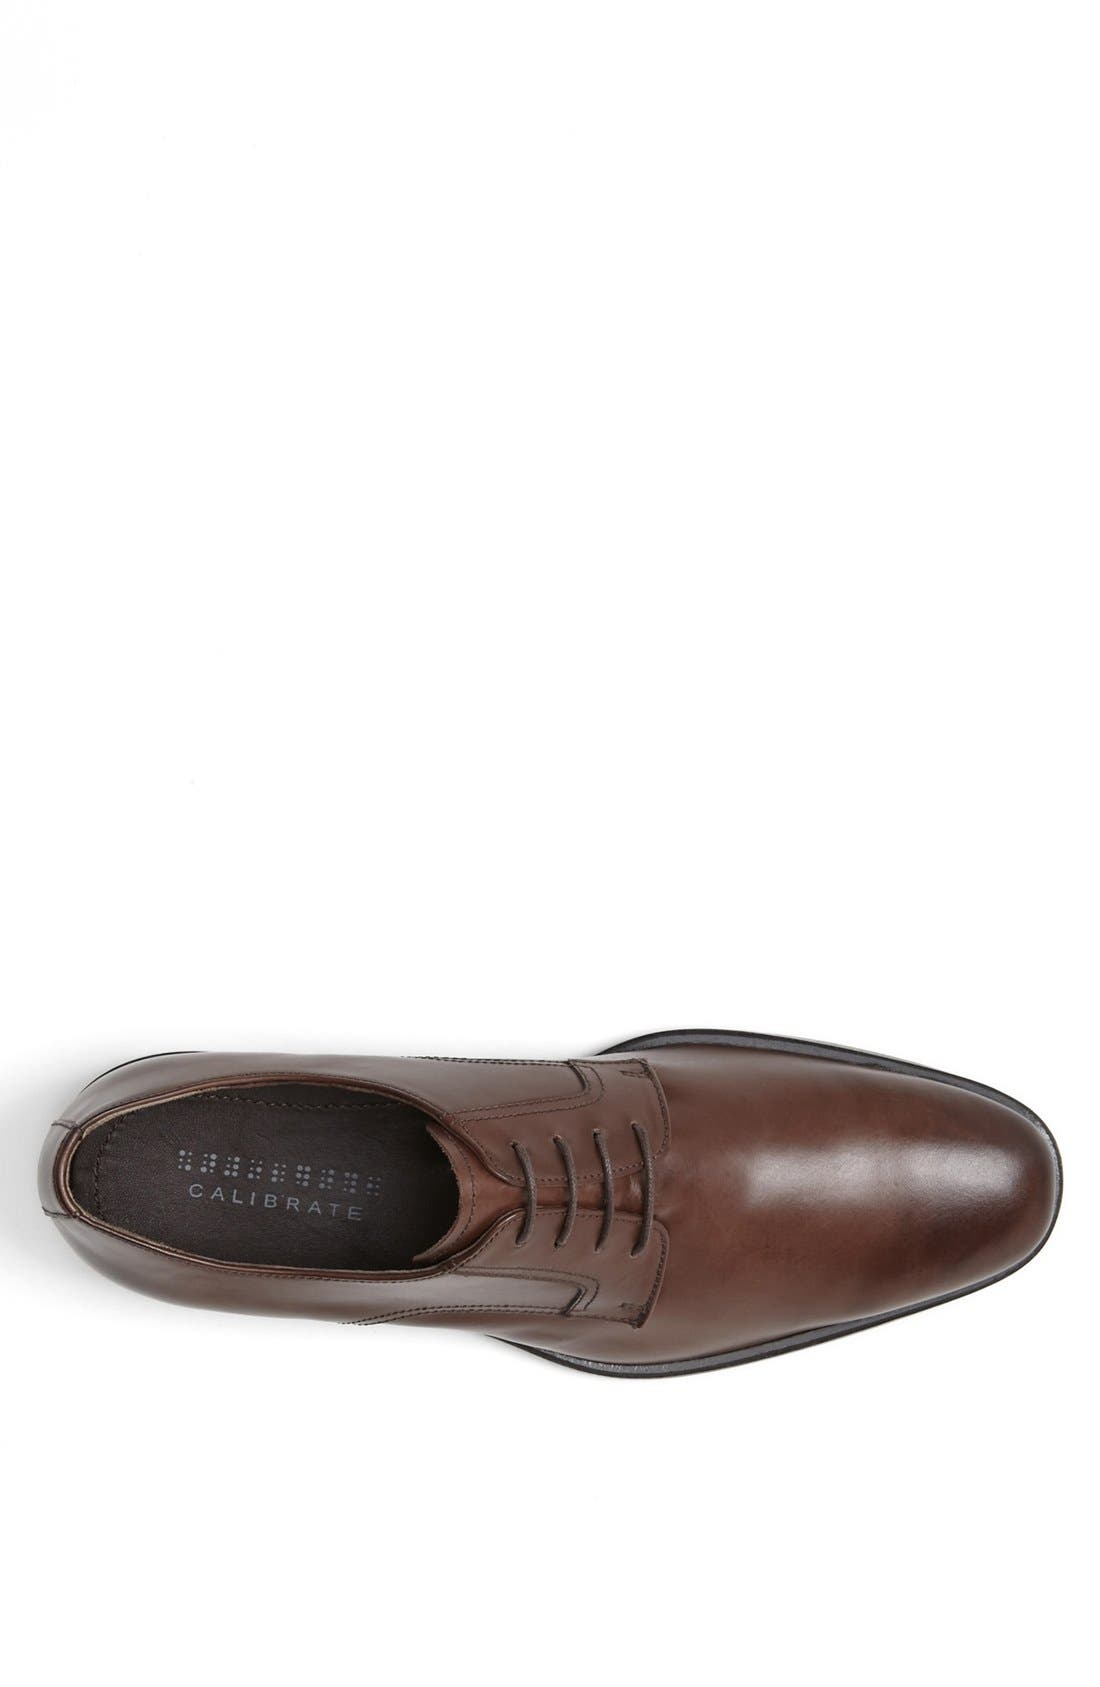 Alternate Image 3  - Calibrate 'Reno' Plain Toe Derby (Men)